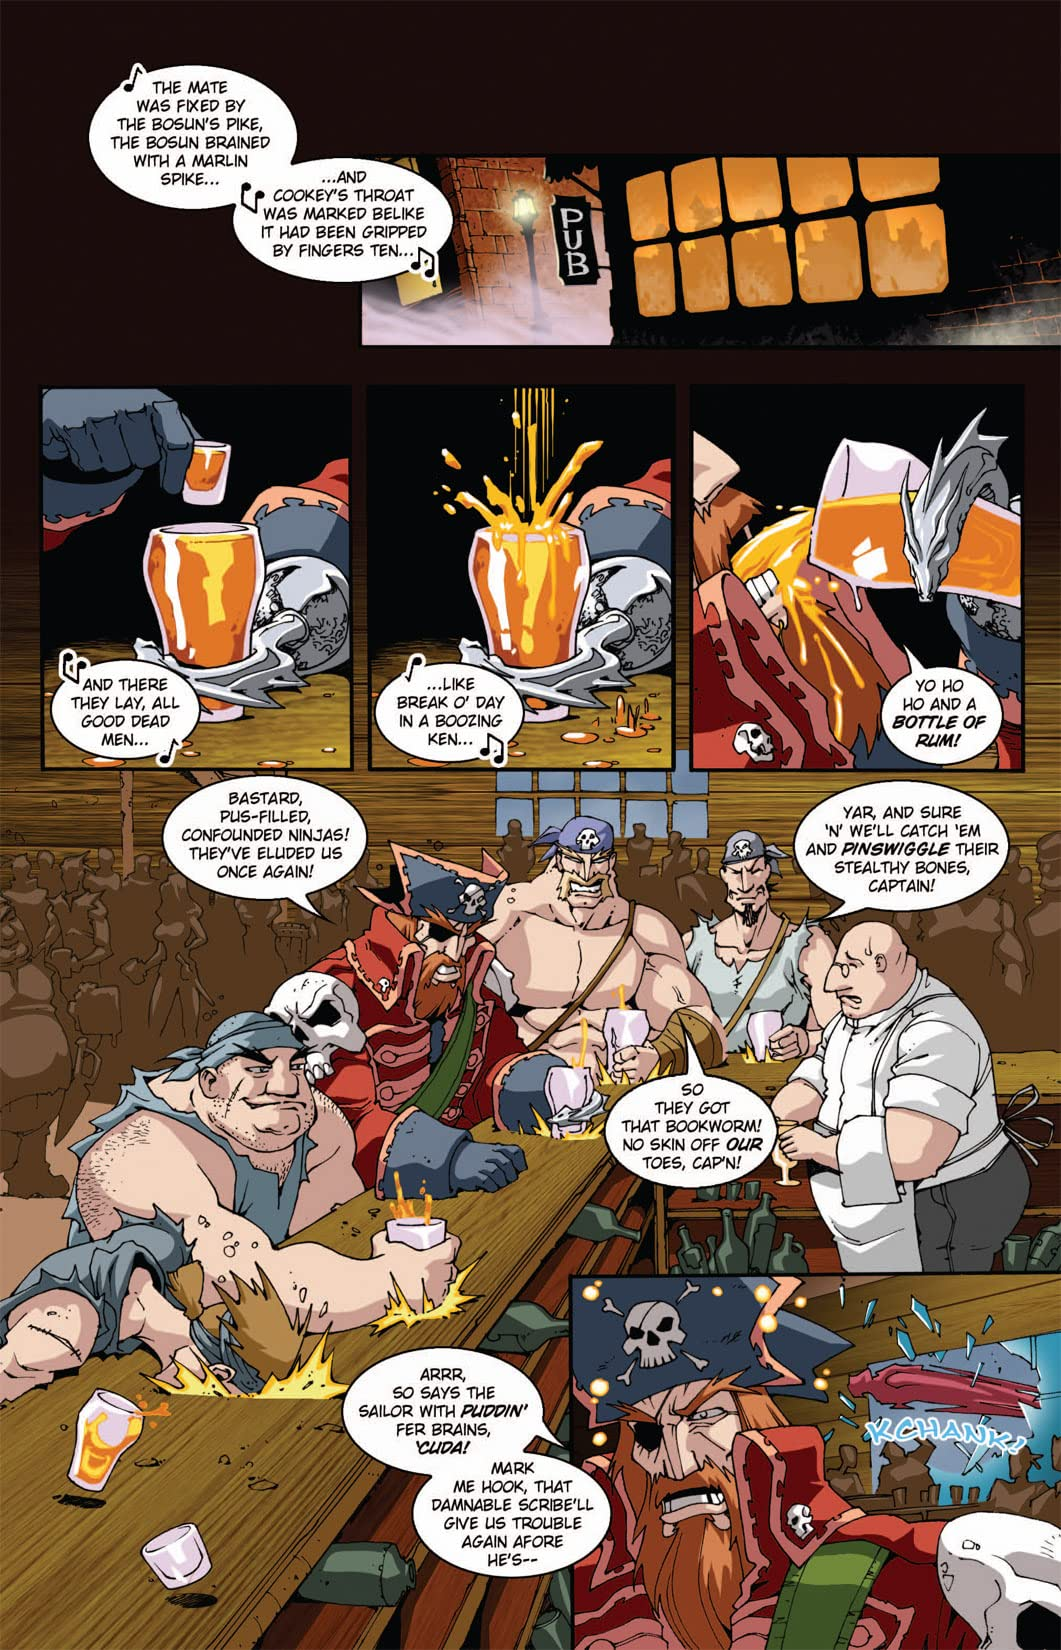 Pirates Vs. Ninjas II: Up the Ante #5 (of 8)